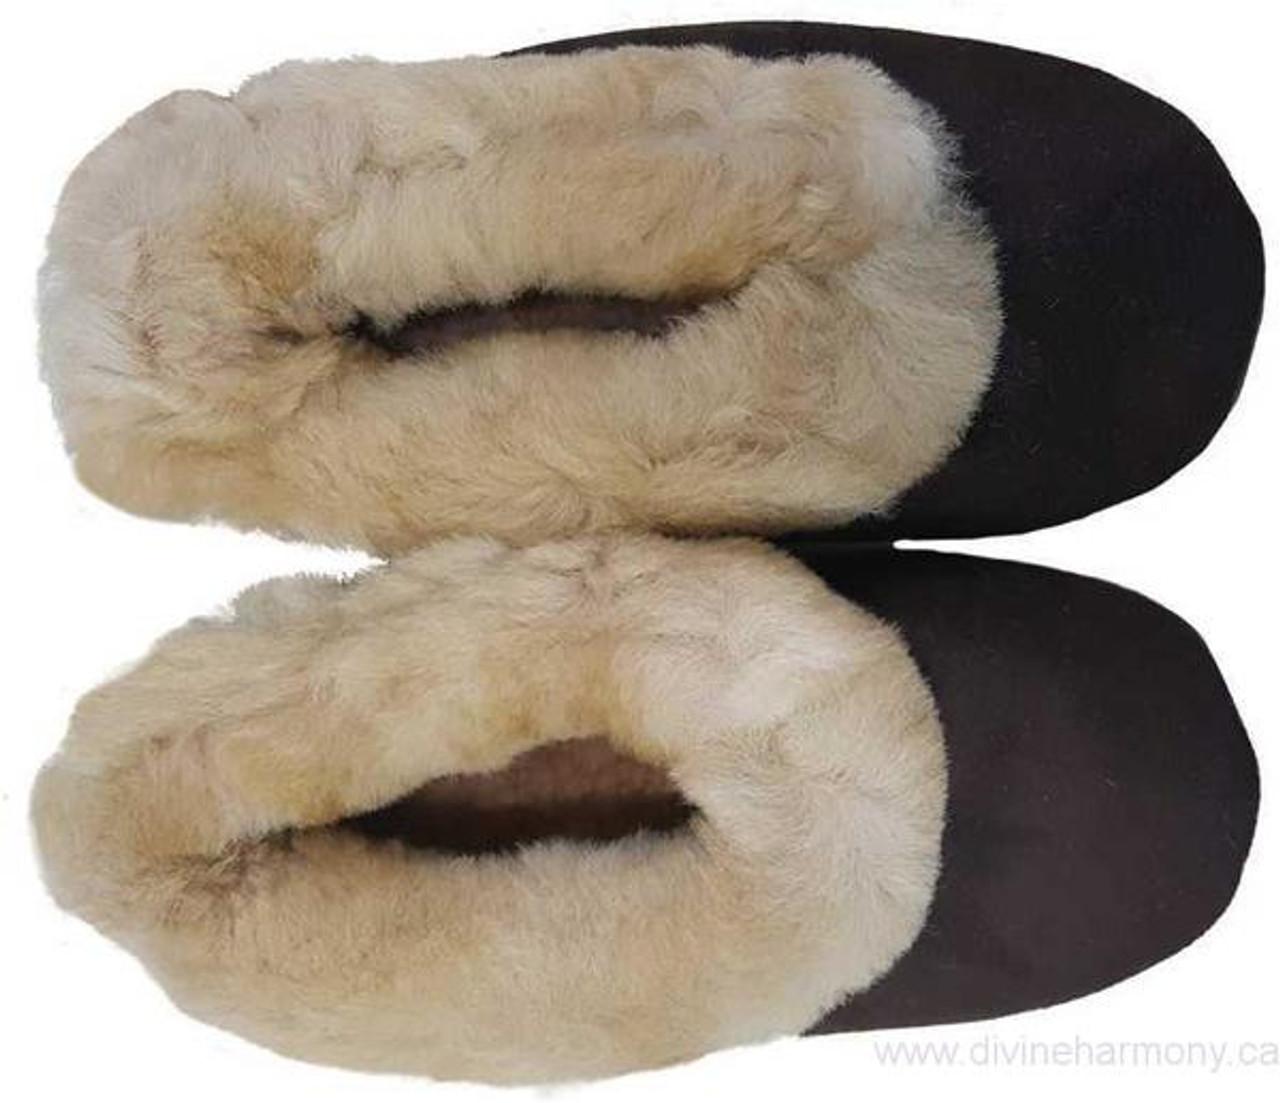 2601f13c6b3 Brown Suede Alpaca Colorful Slippers Multicolor Unisex Size 6-11 ...